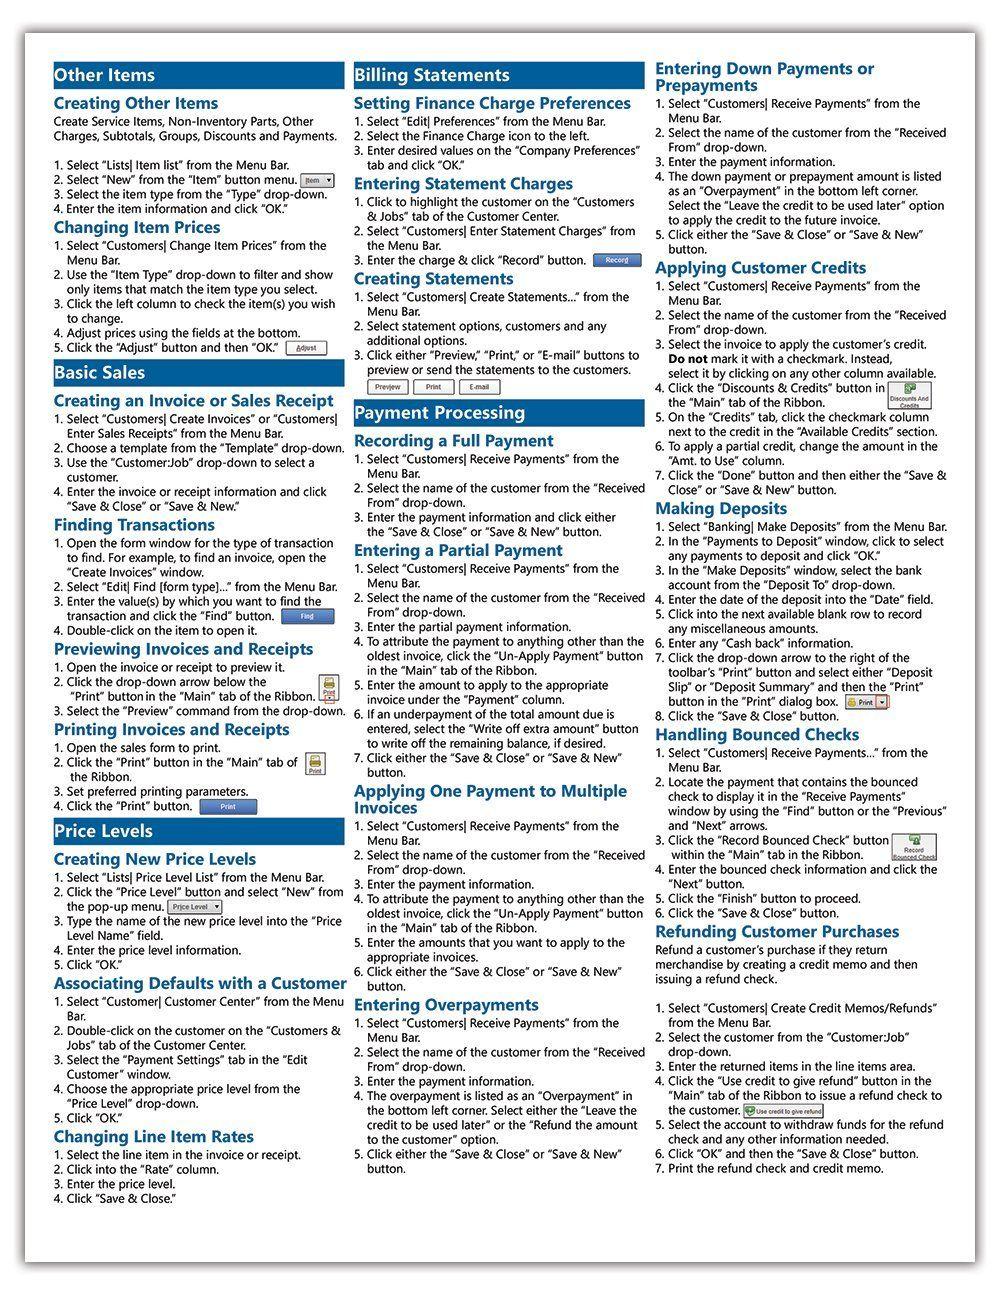 quickbooks pro 2015 quick reference training card laminated guide rh pinterest com au